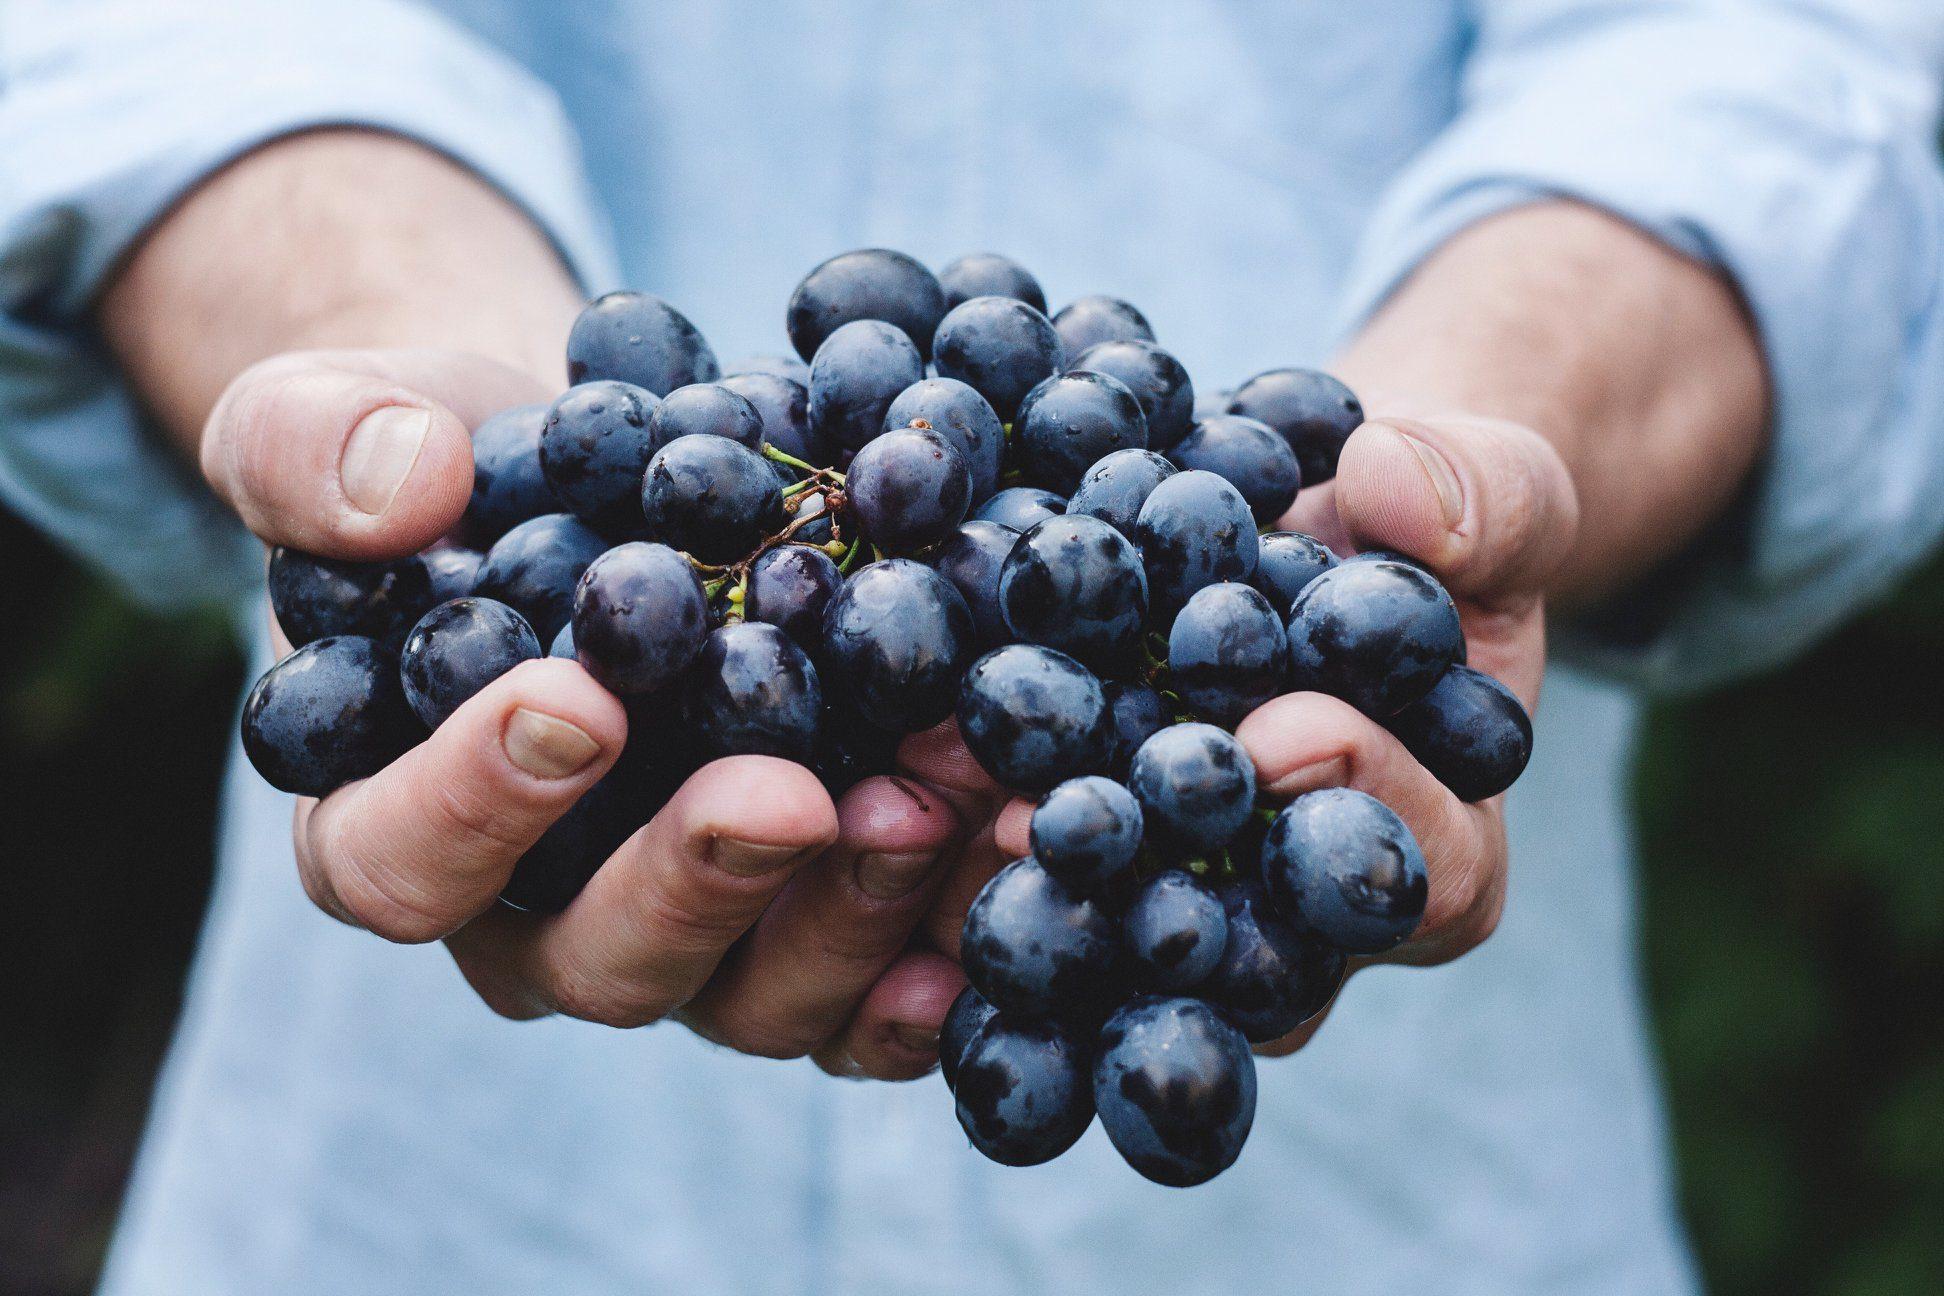 marche, ancona, vino, produttori vino, vino rosso, vino bianco, miele, lavanda, enogastronomia